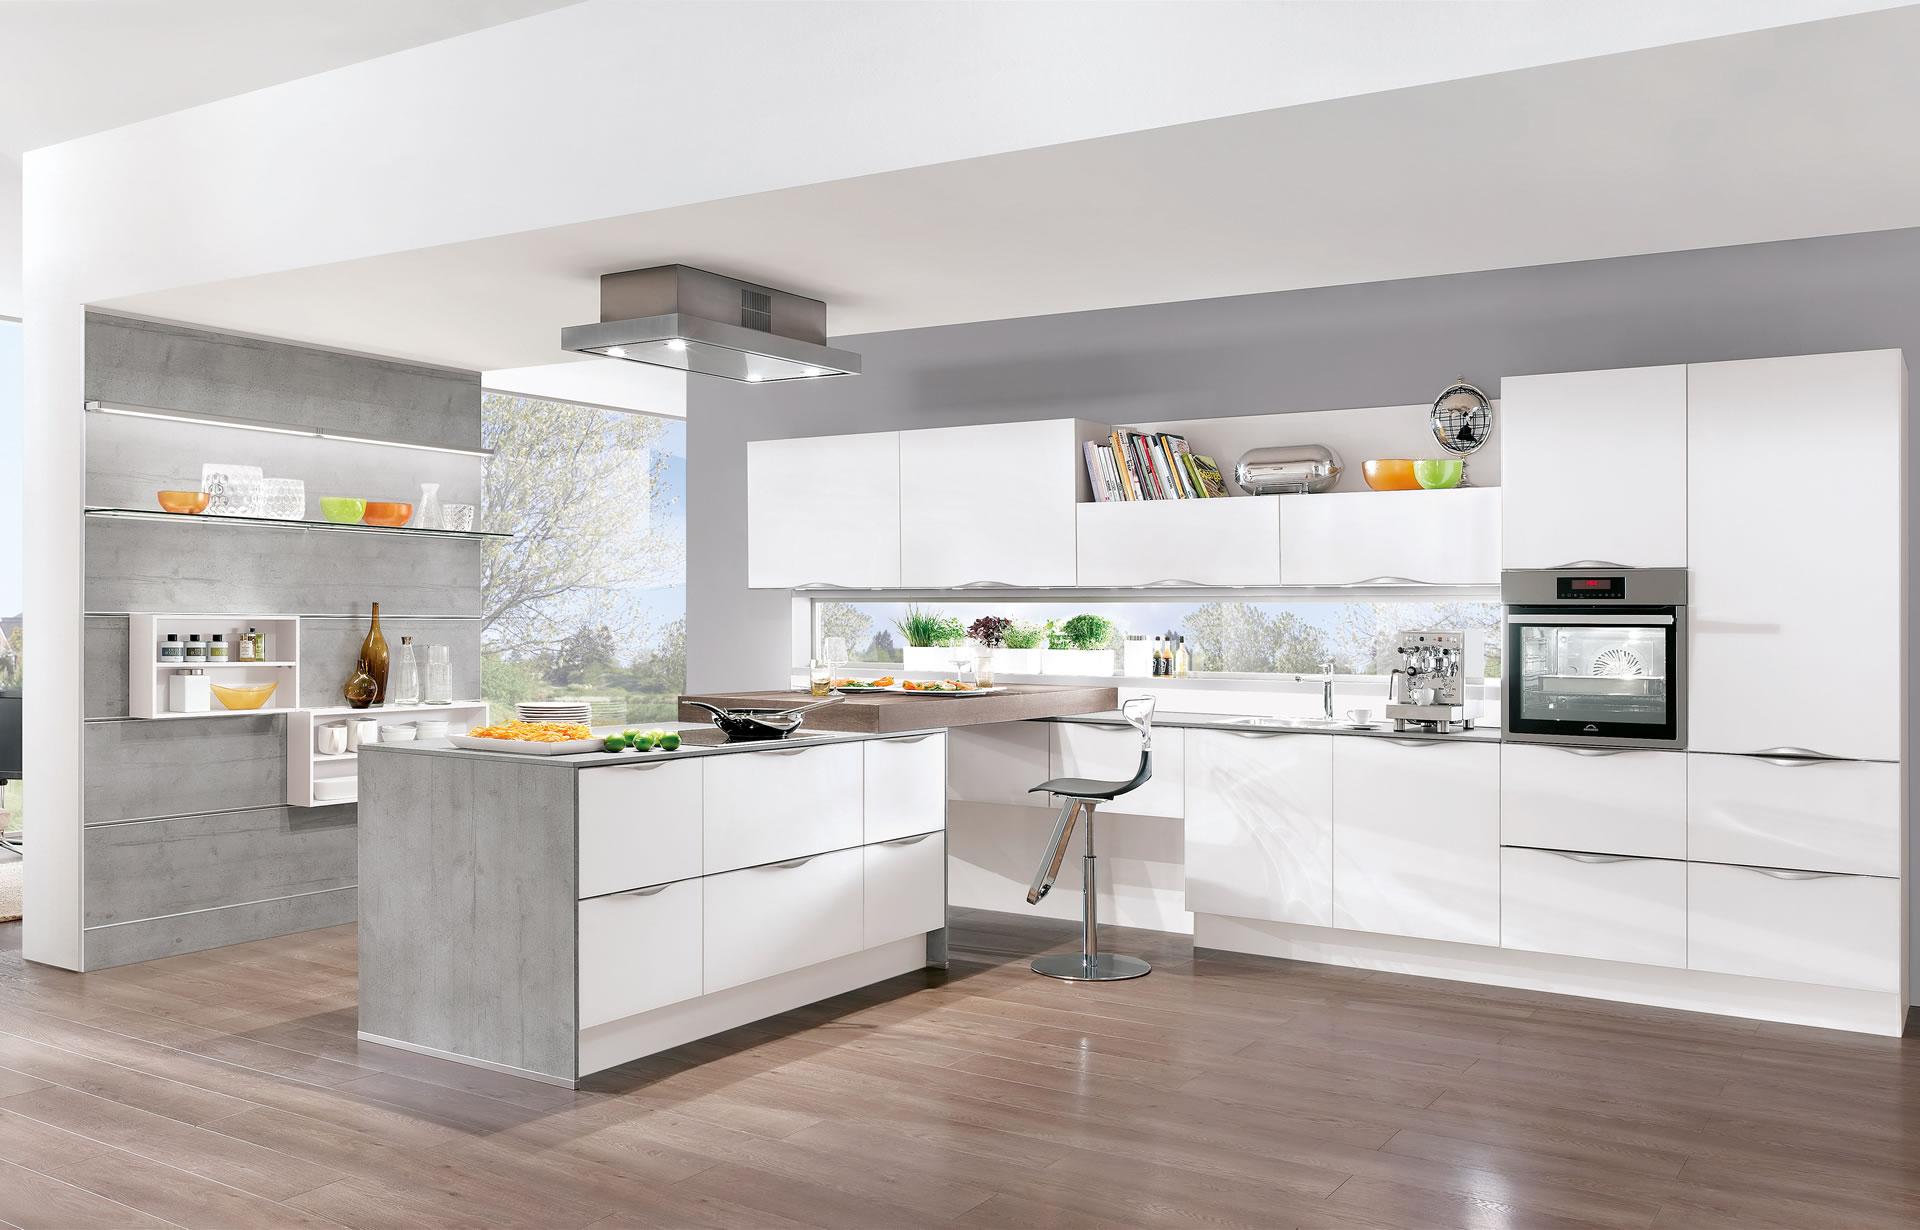 Beautiful Preise Nobilia Küchen Images - Milbank.us - milbank.us